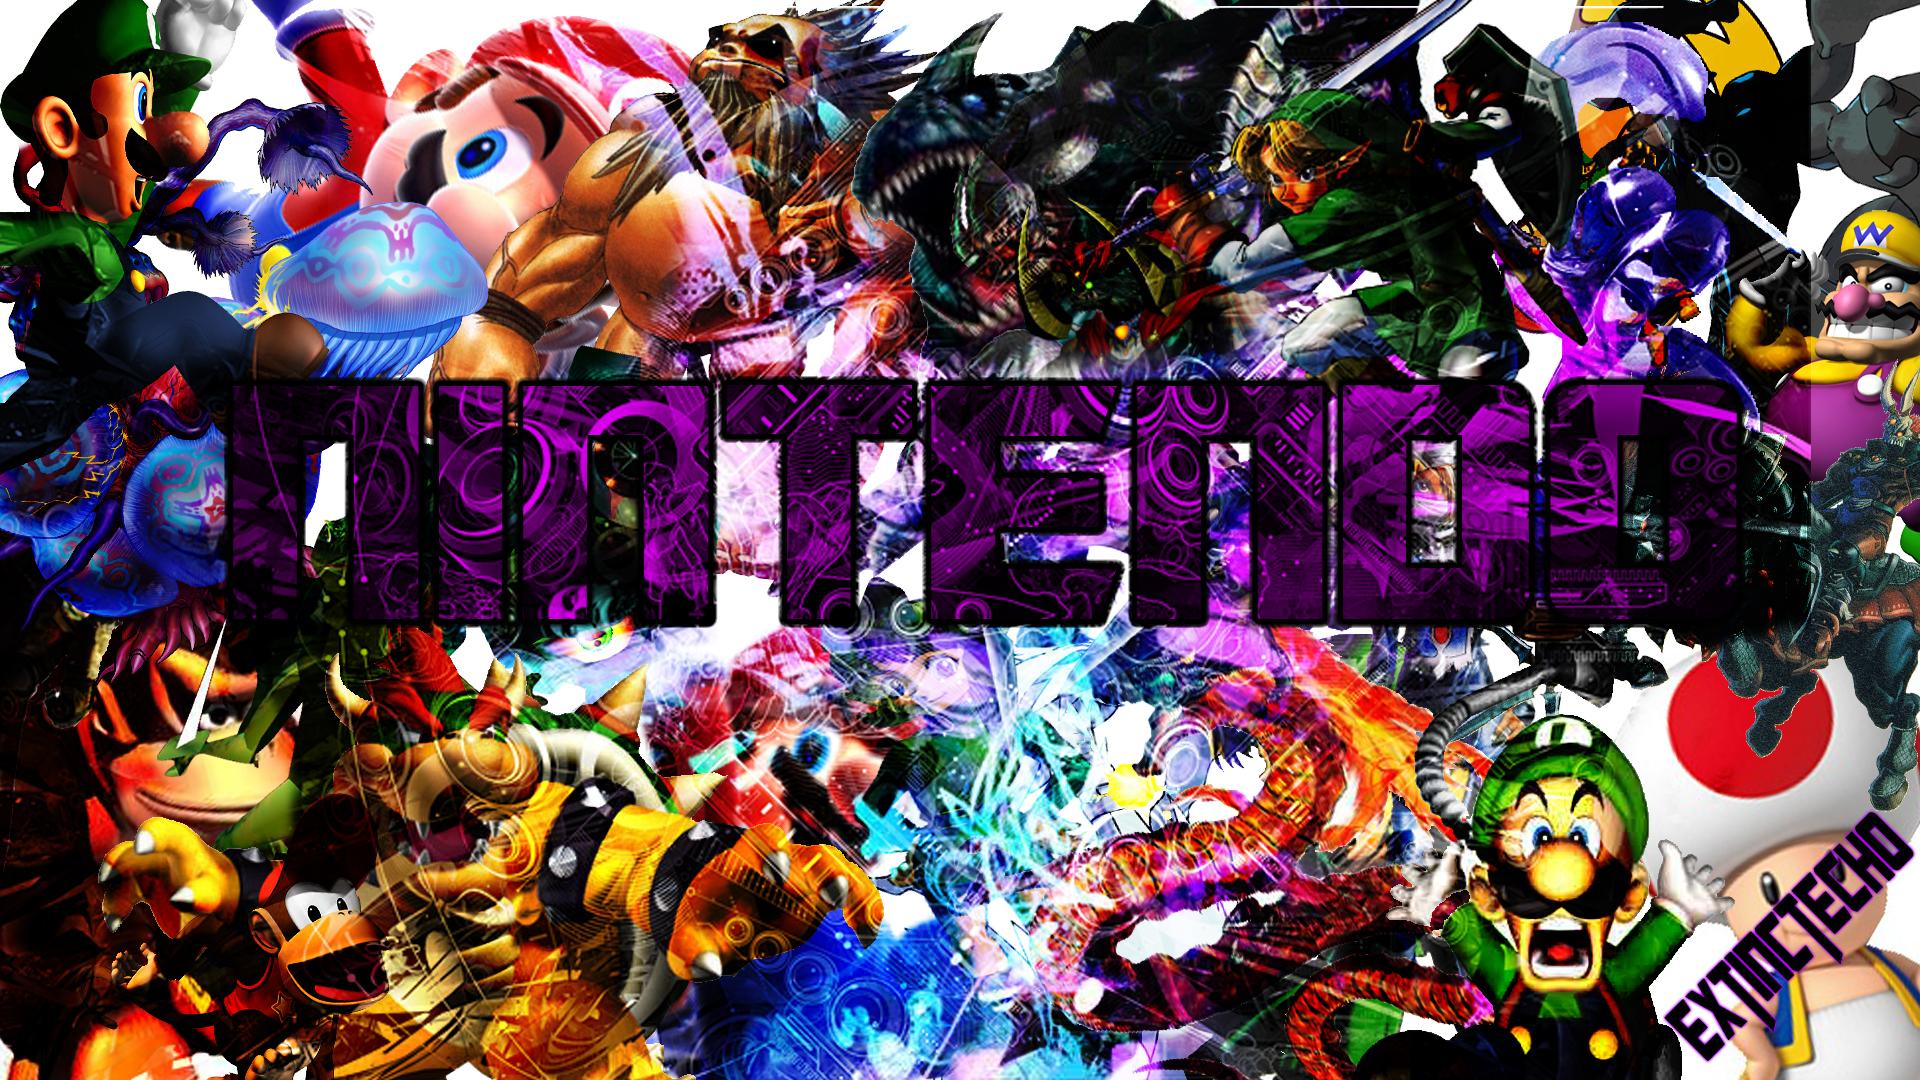 Image Nintendo Wallpapers Jpg Legends Of The Multi Universe Wiki